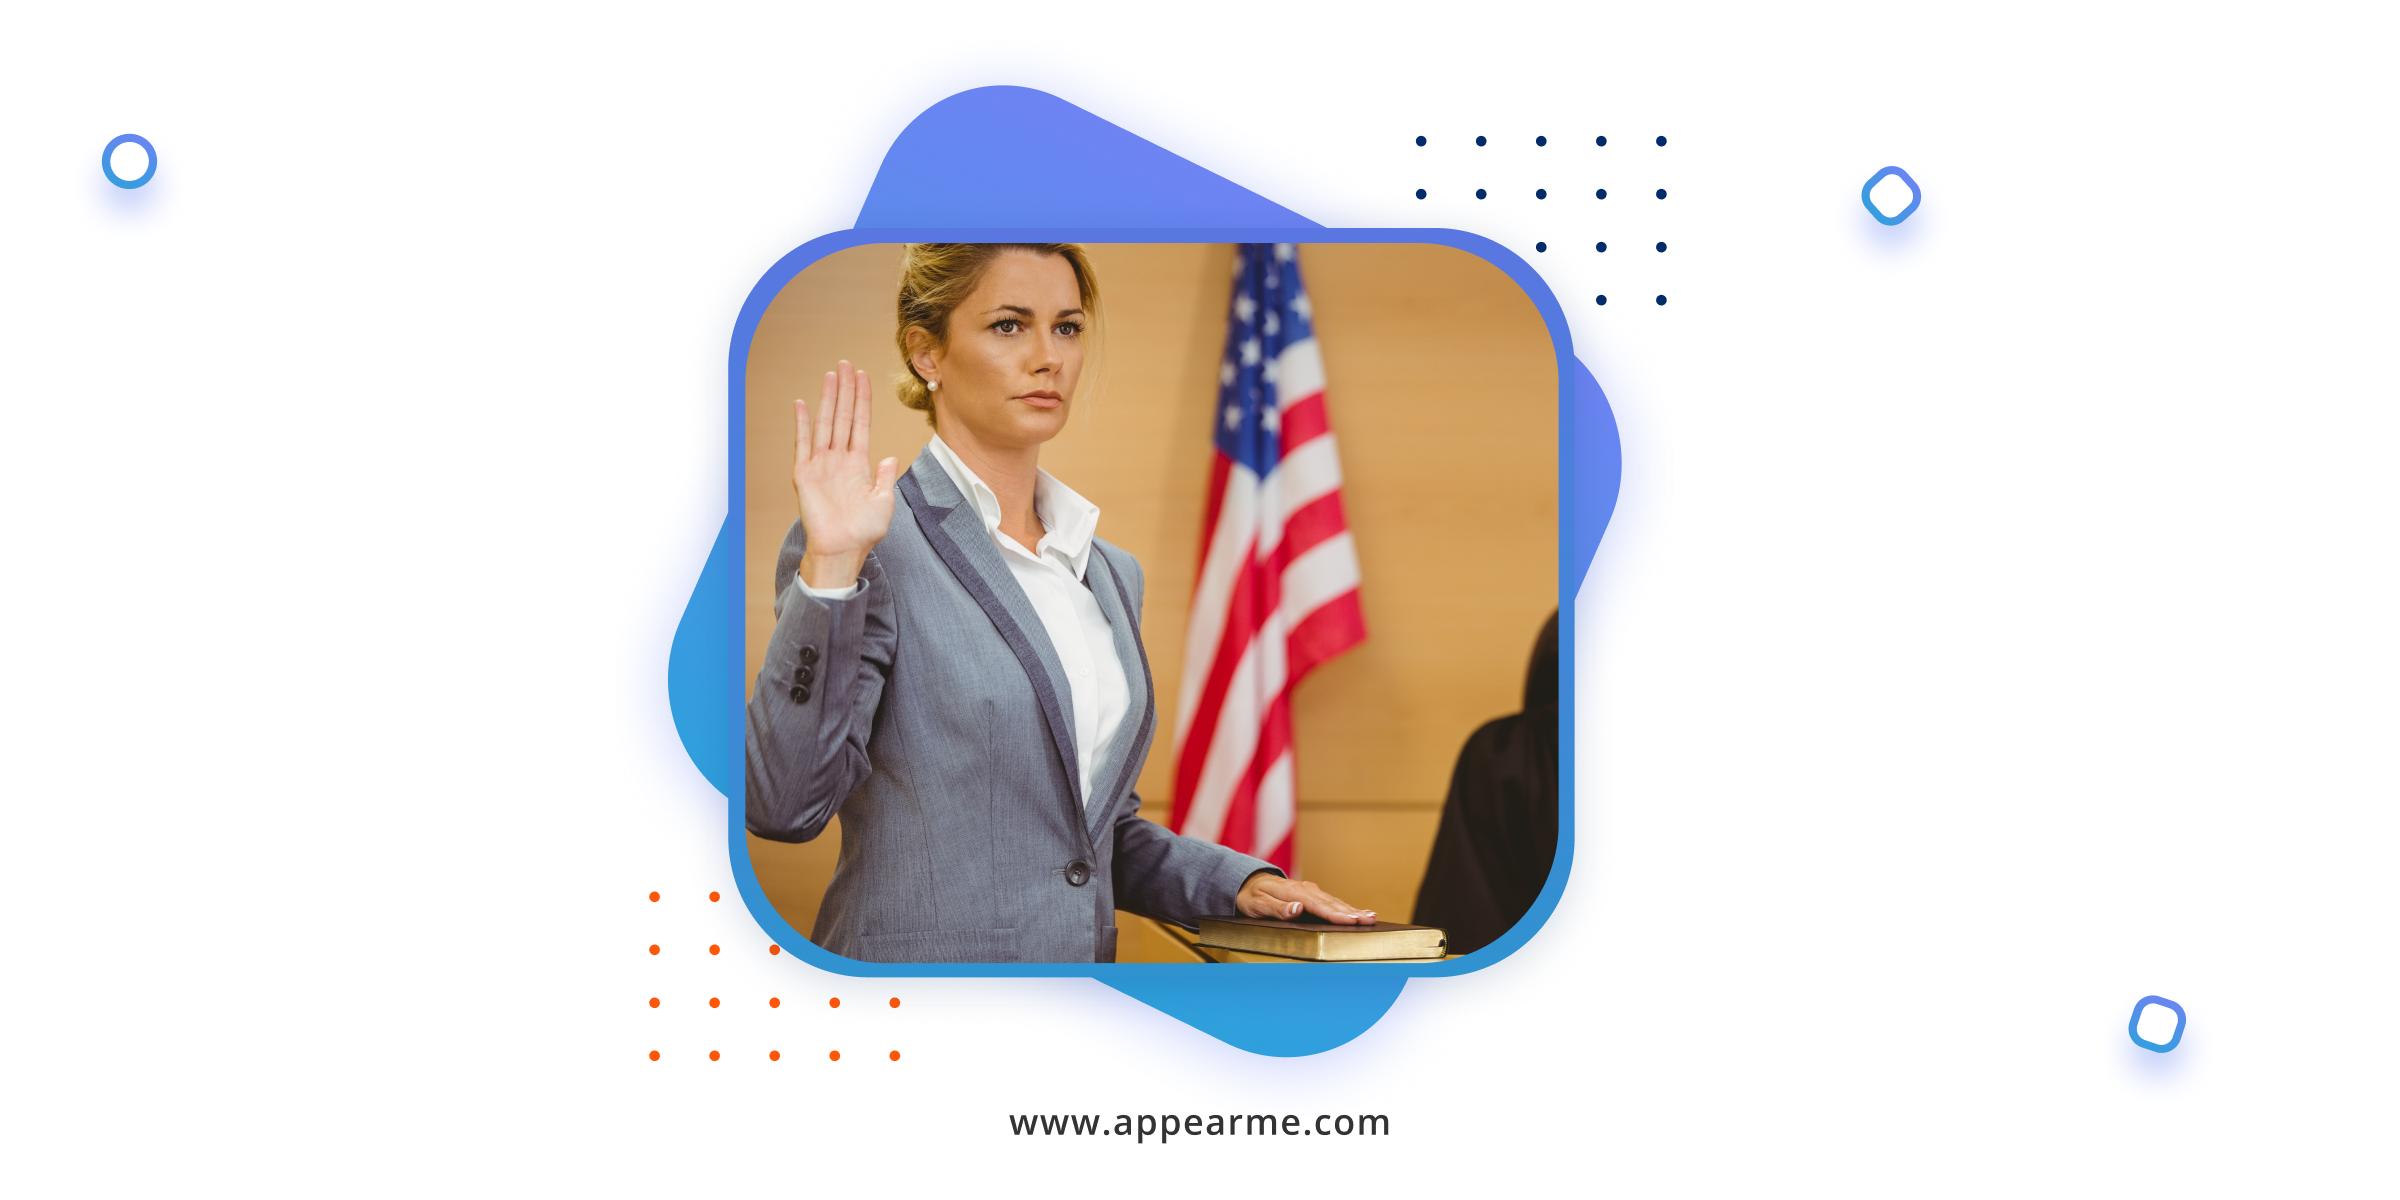 An Expert Witness Can Make or Break a Case